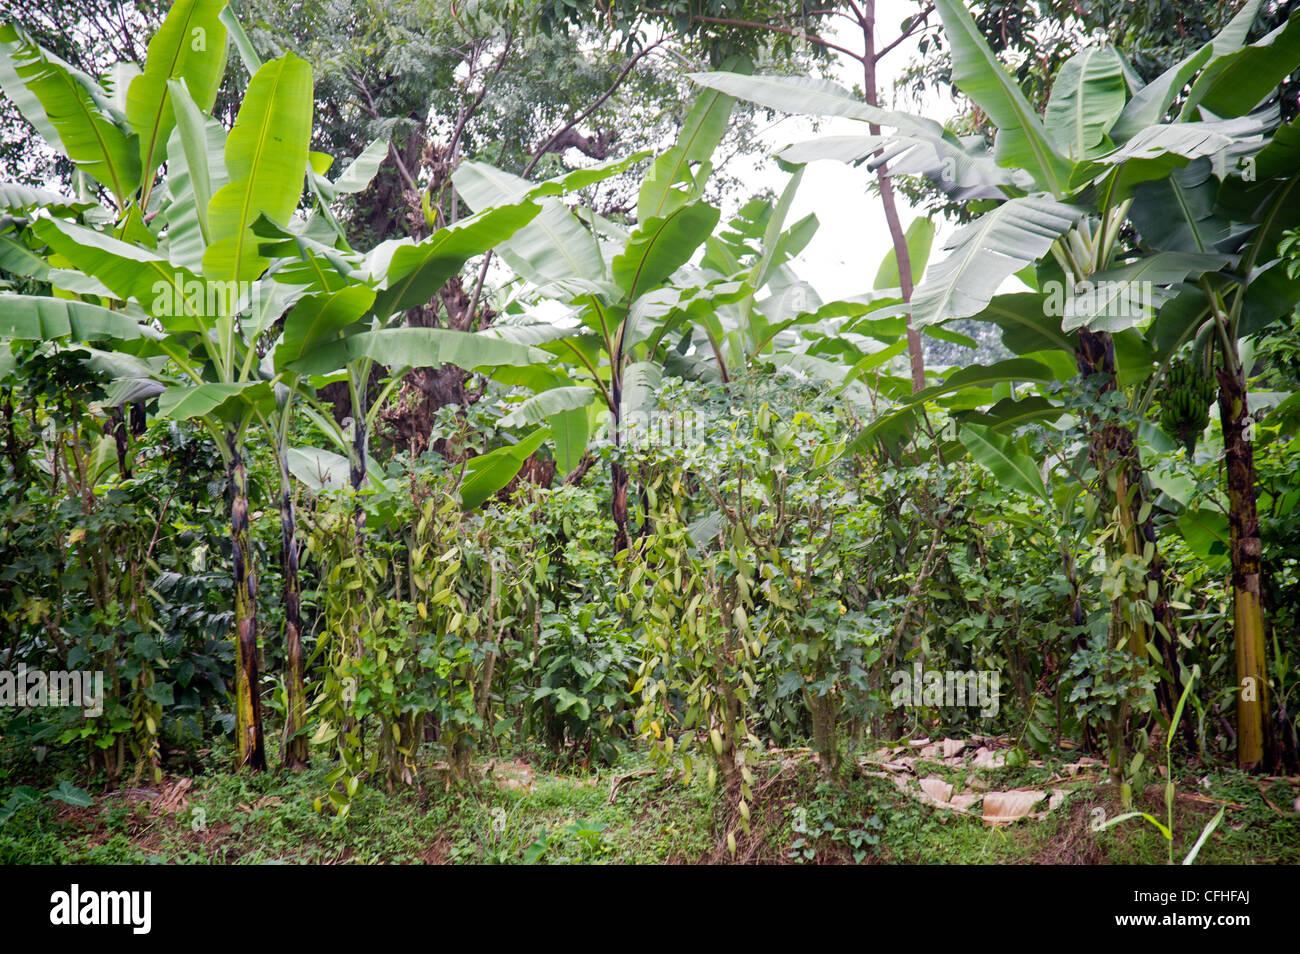 Vanilla farm in the Rwenzori Mountains near Bundibugyo, western Uganda. - Stock Image